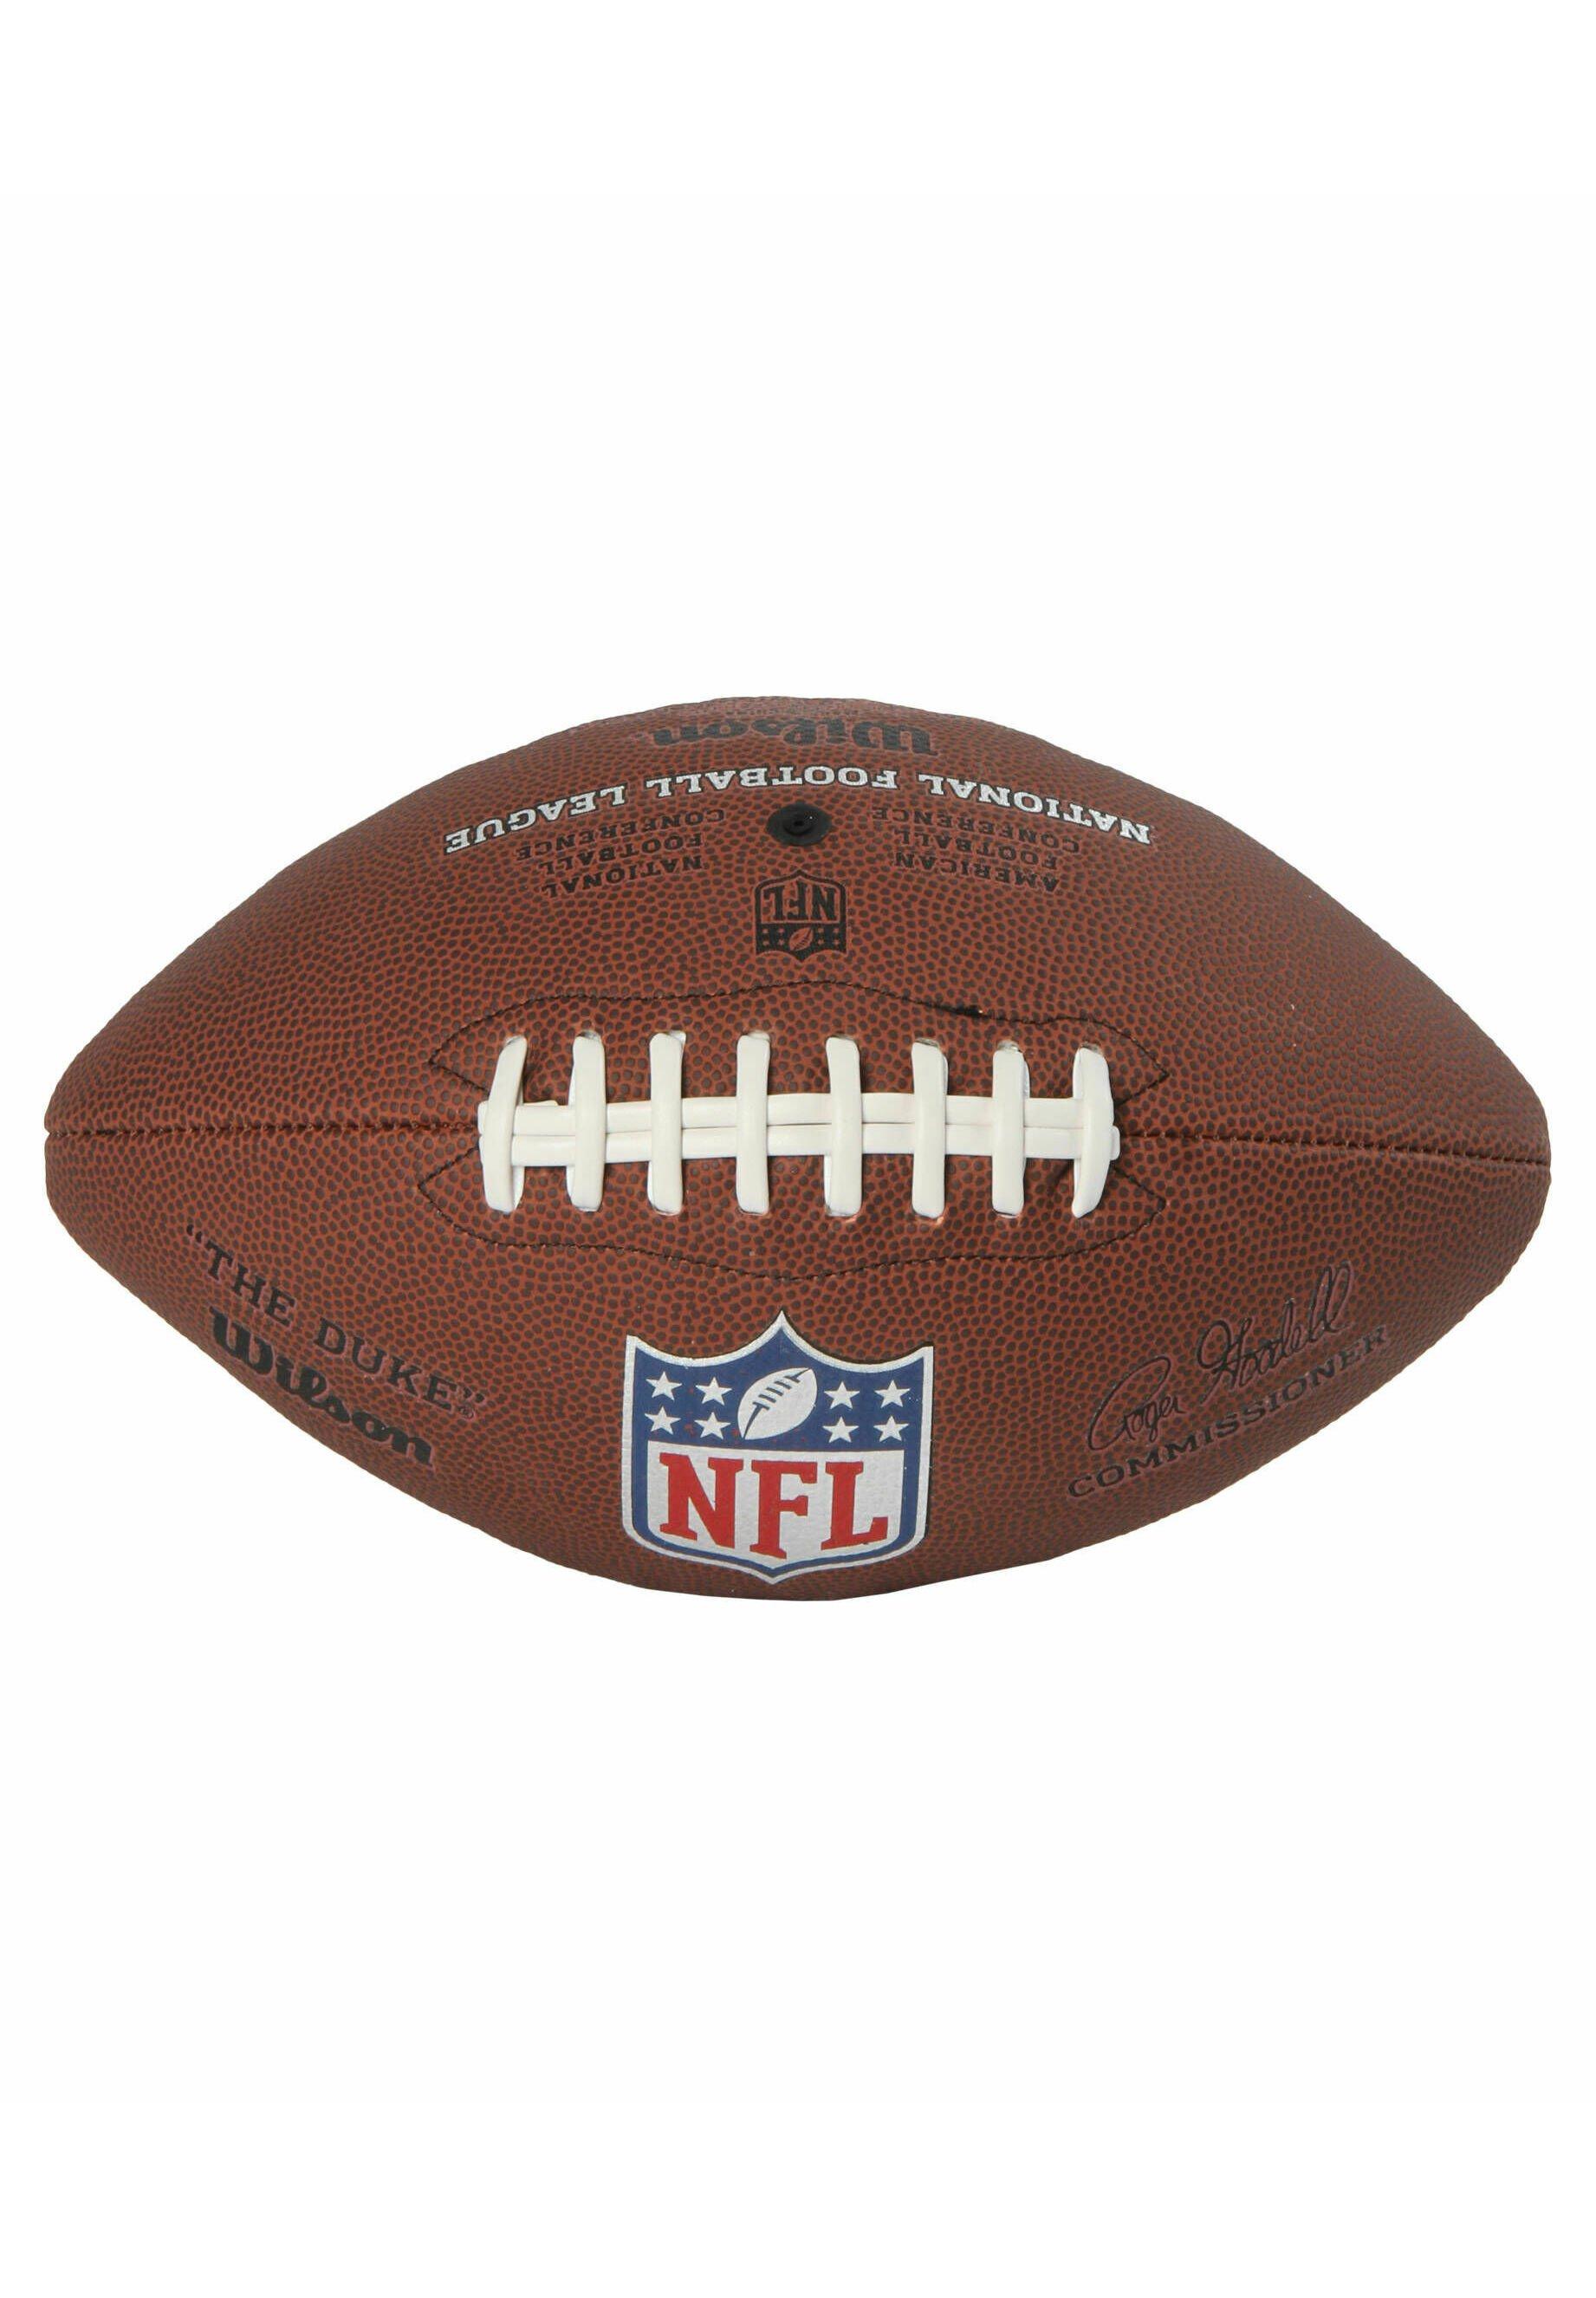 Herren NFL DUKE REPLUCA  - Fußball - braun